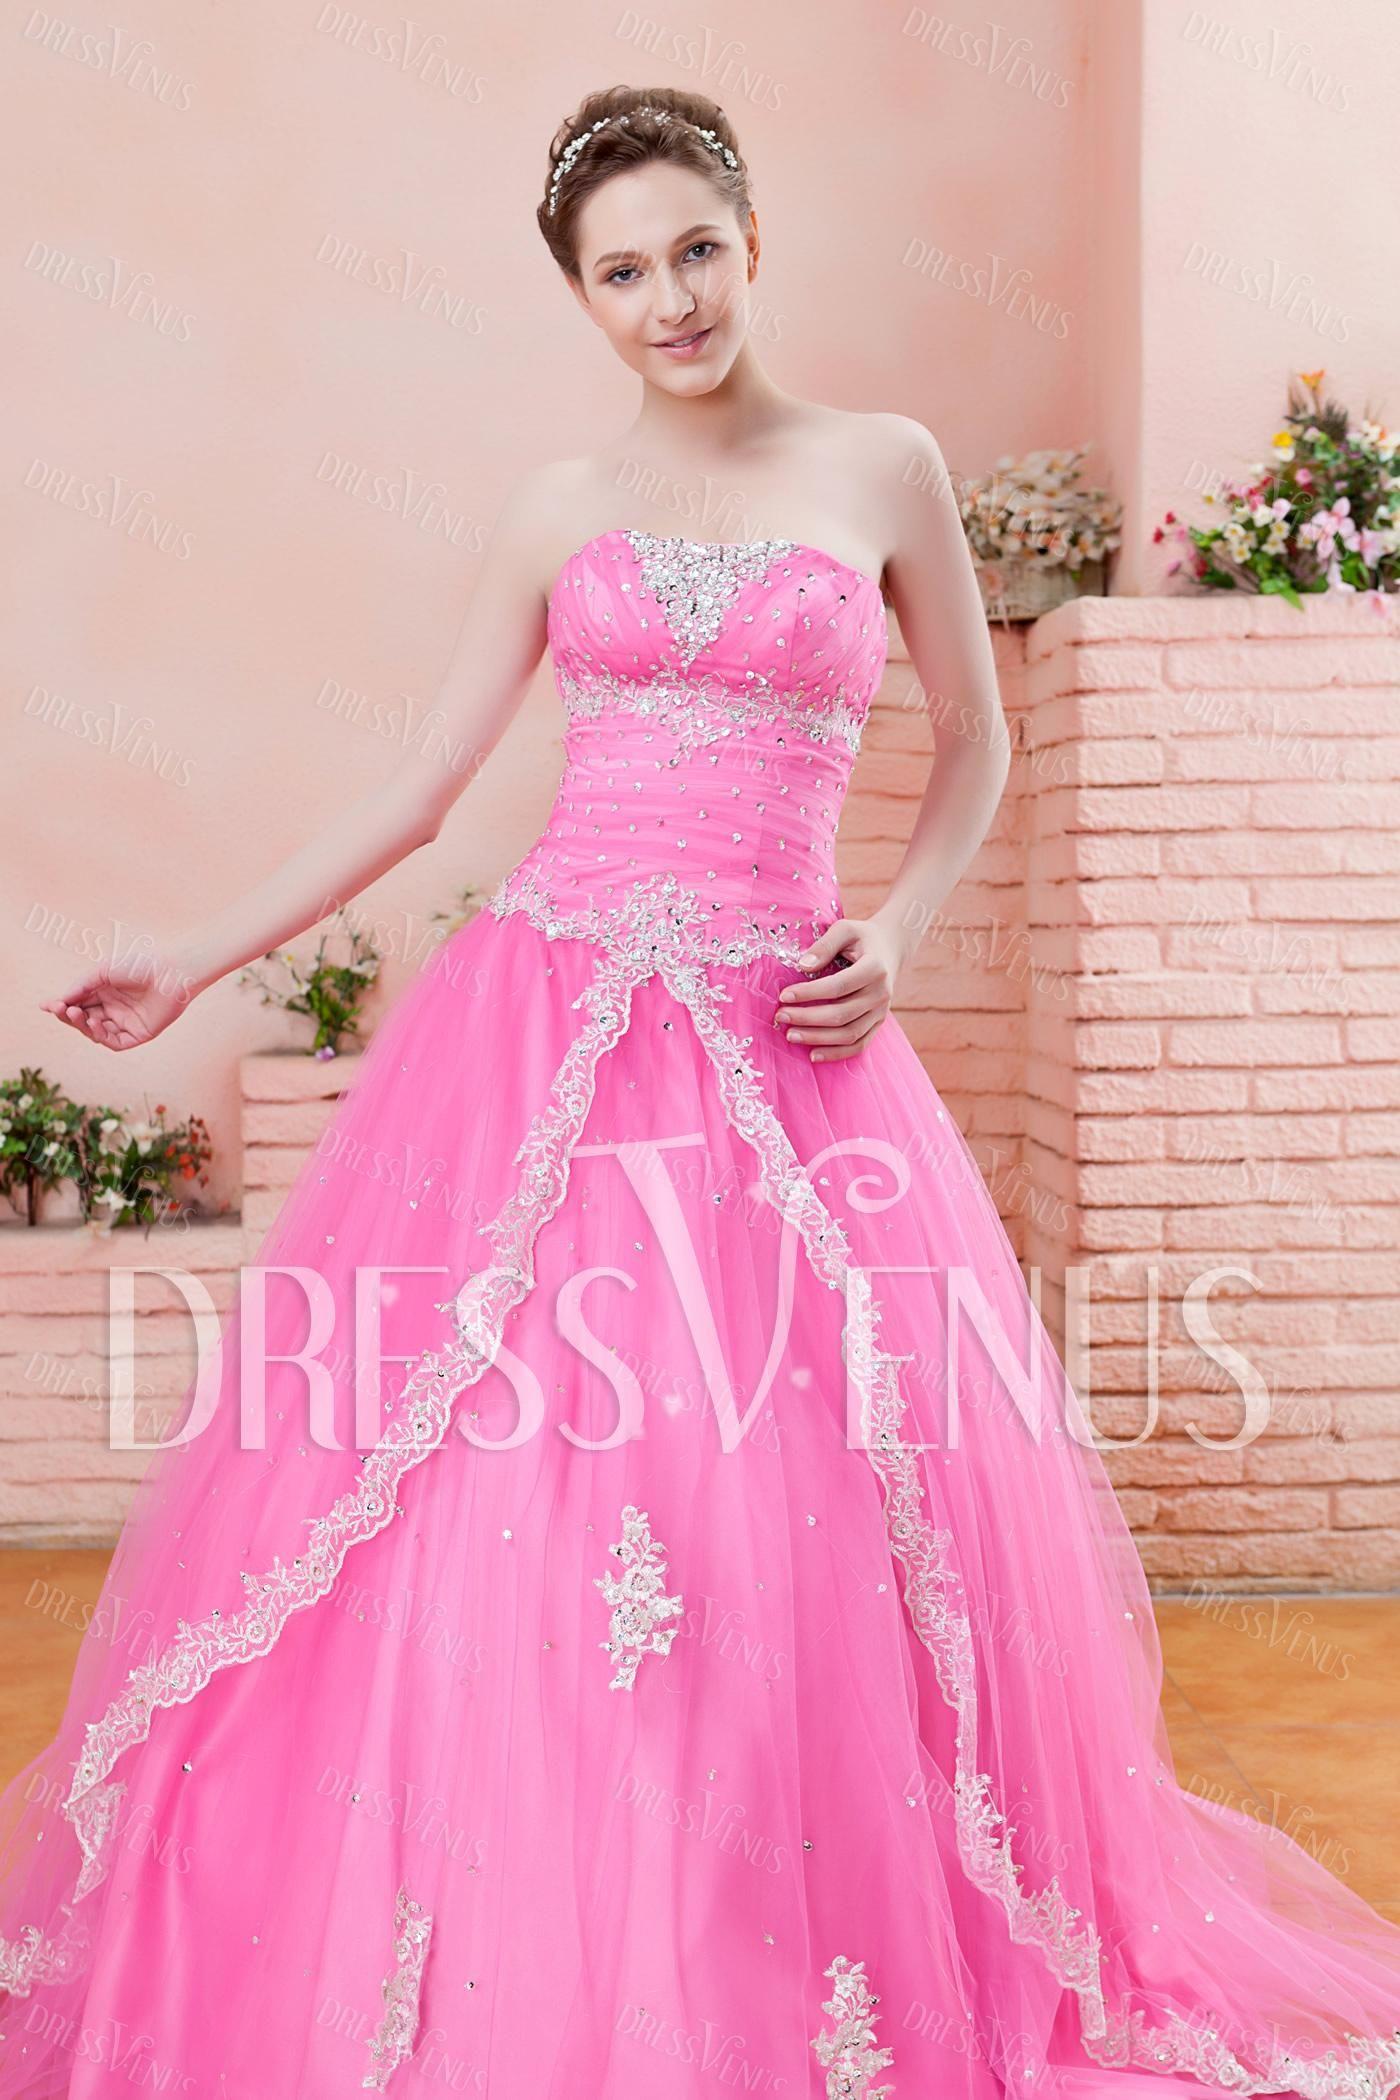 Pink #Dress . | Lillis | Pinterest | Vestidos bonitos, Rosa y Vestidos